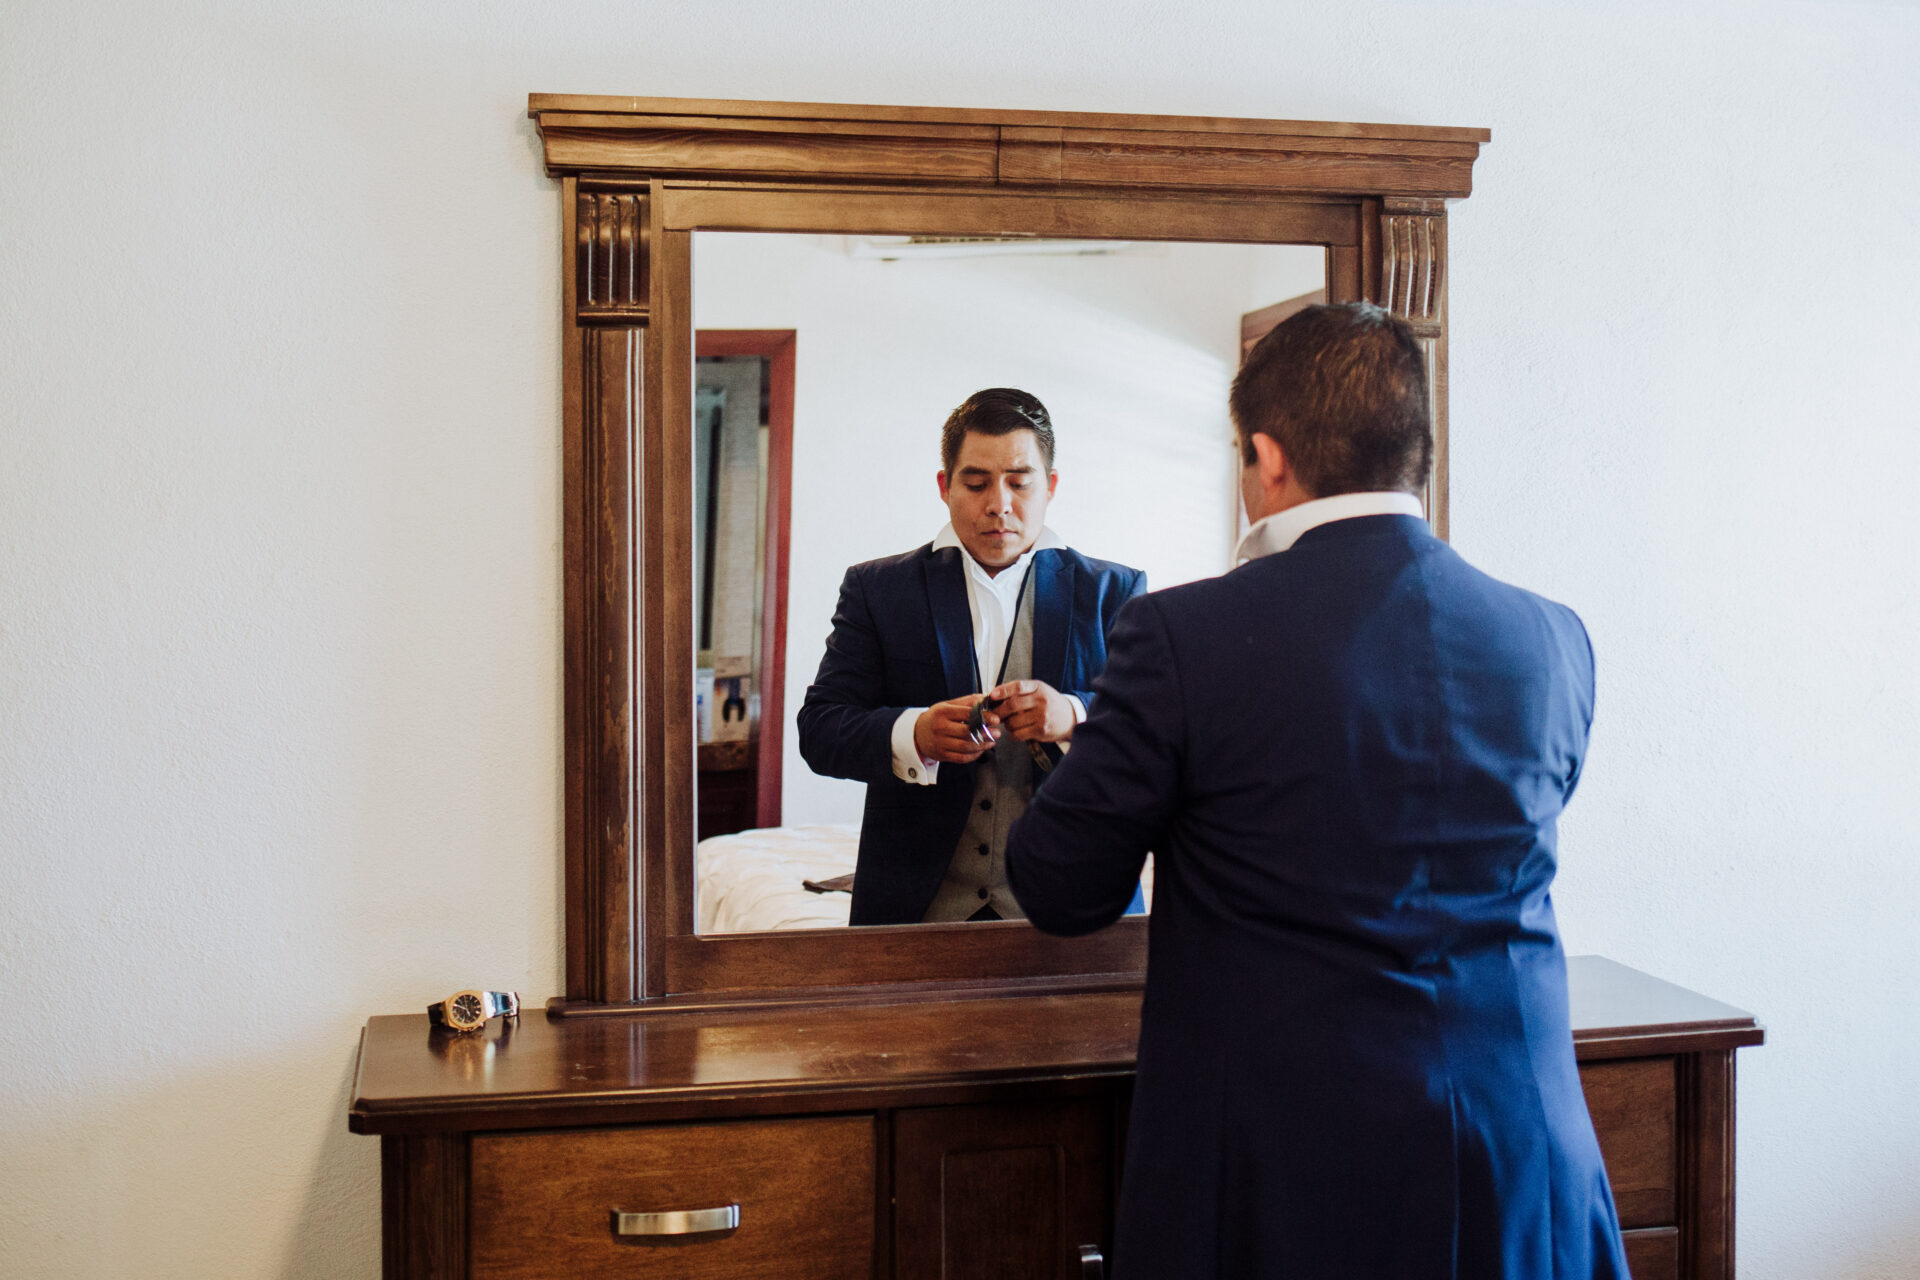 javier_noriega_fotografo_bodas_torreon_coahuila_zacatecas_wedding_photographer10a